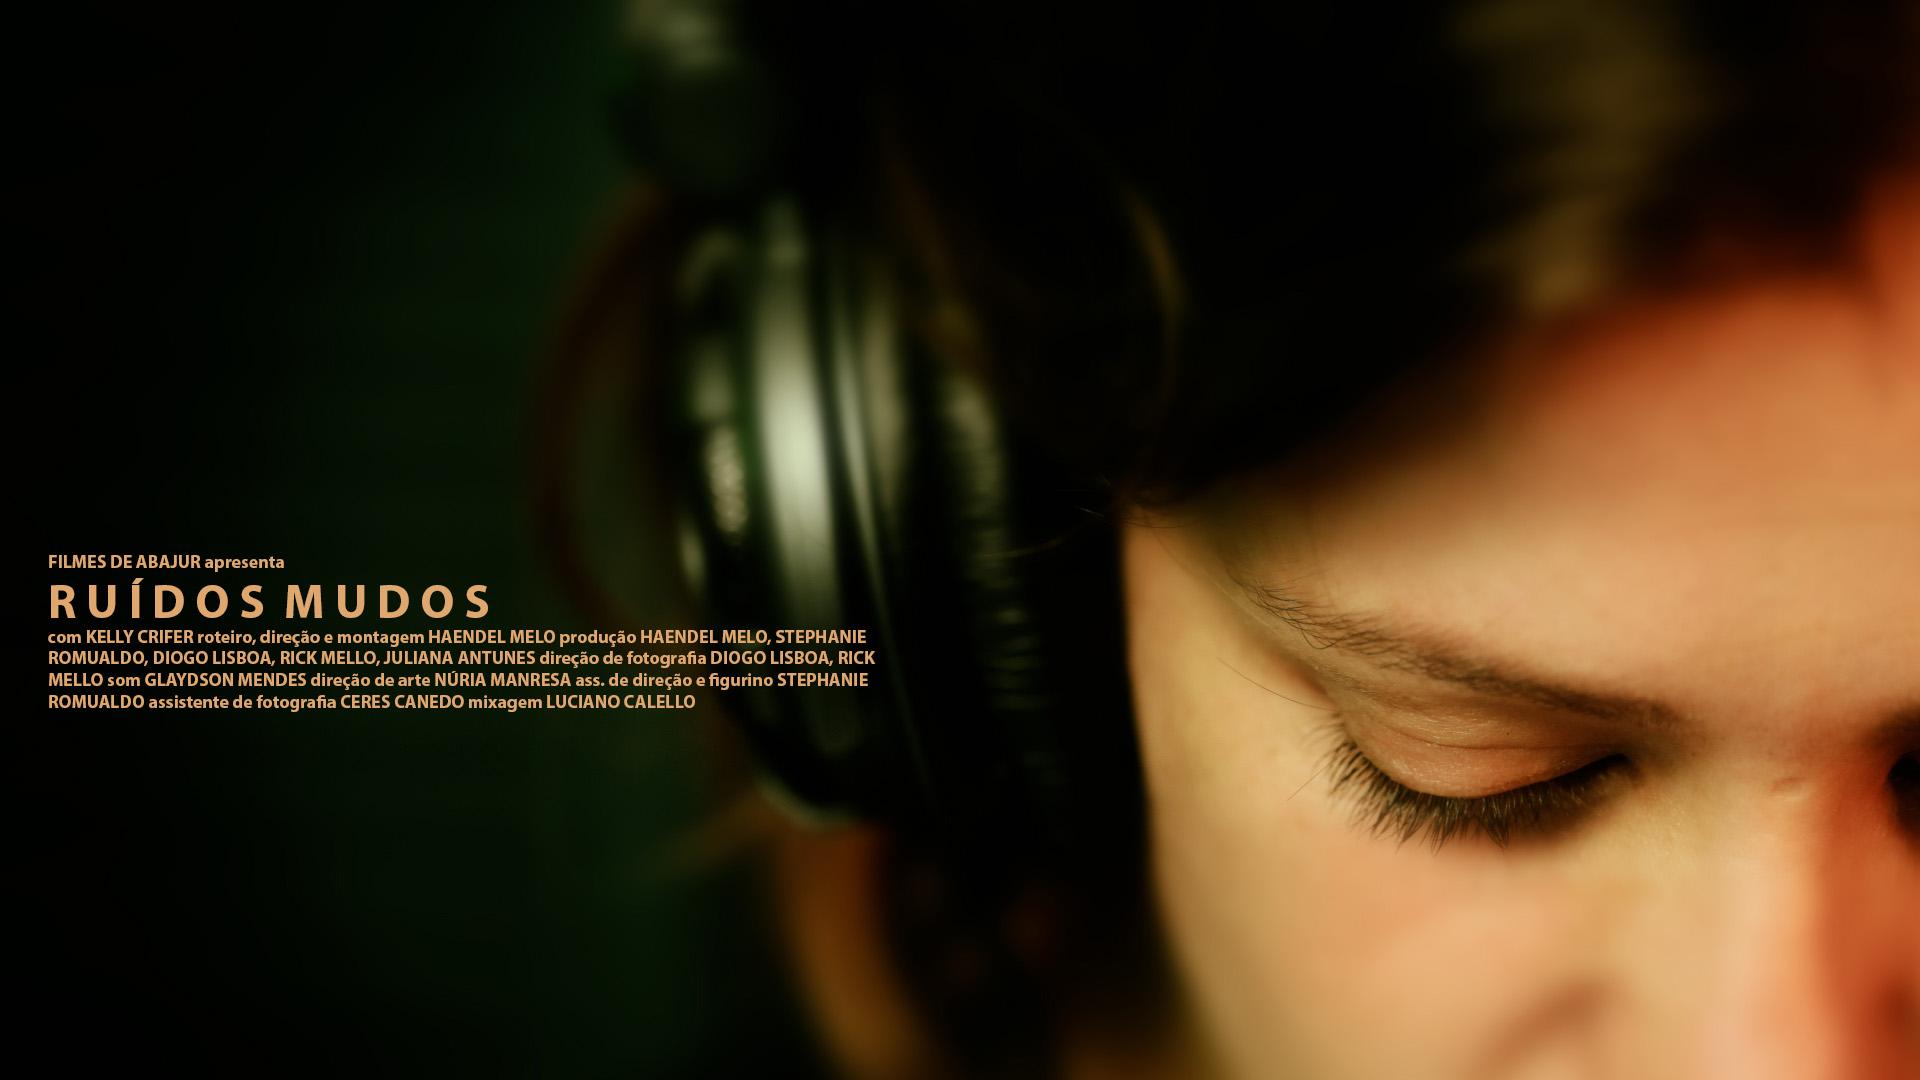 Ruidos Mudos poster.jpg